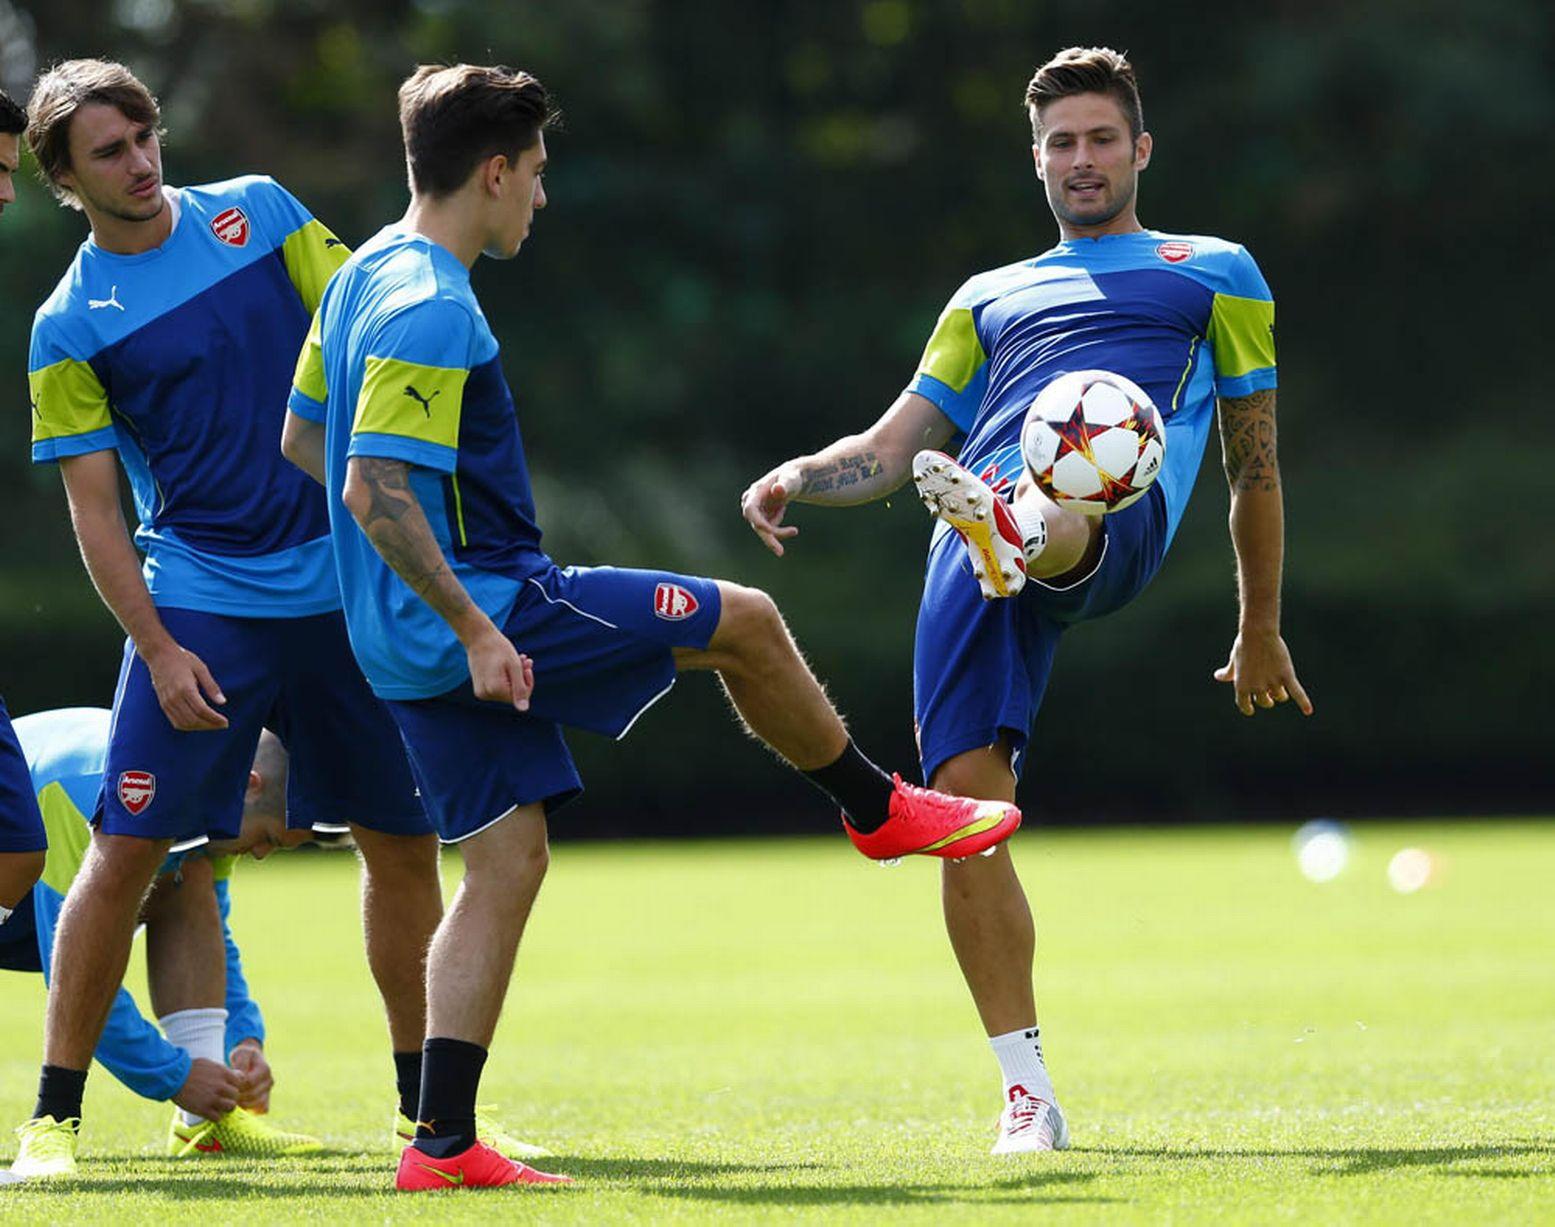 Arsenal-Training-Pics 4